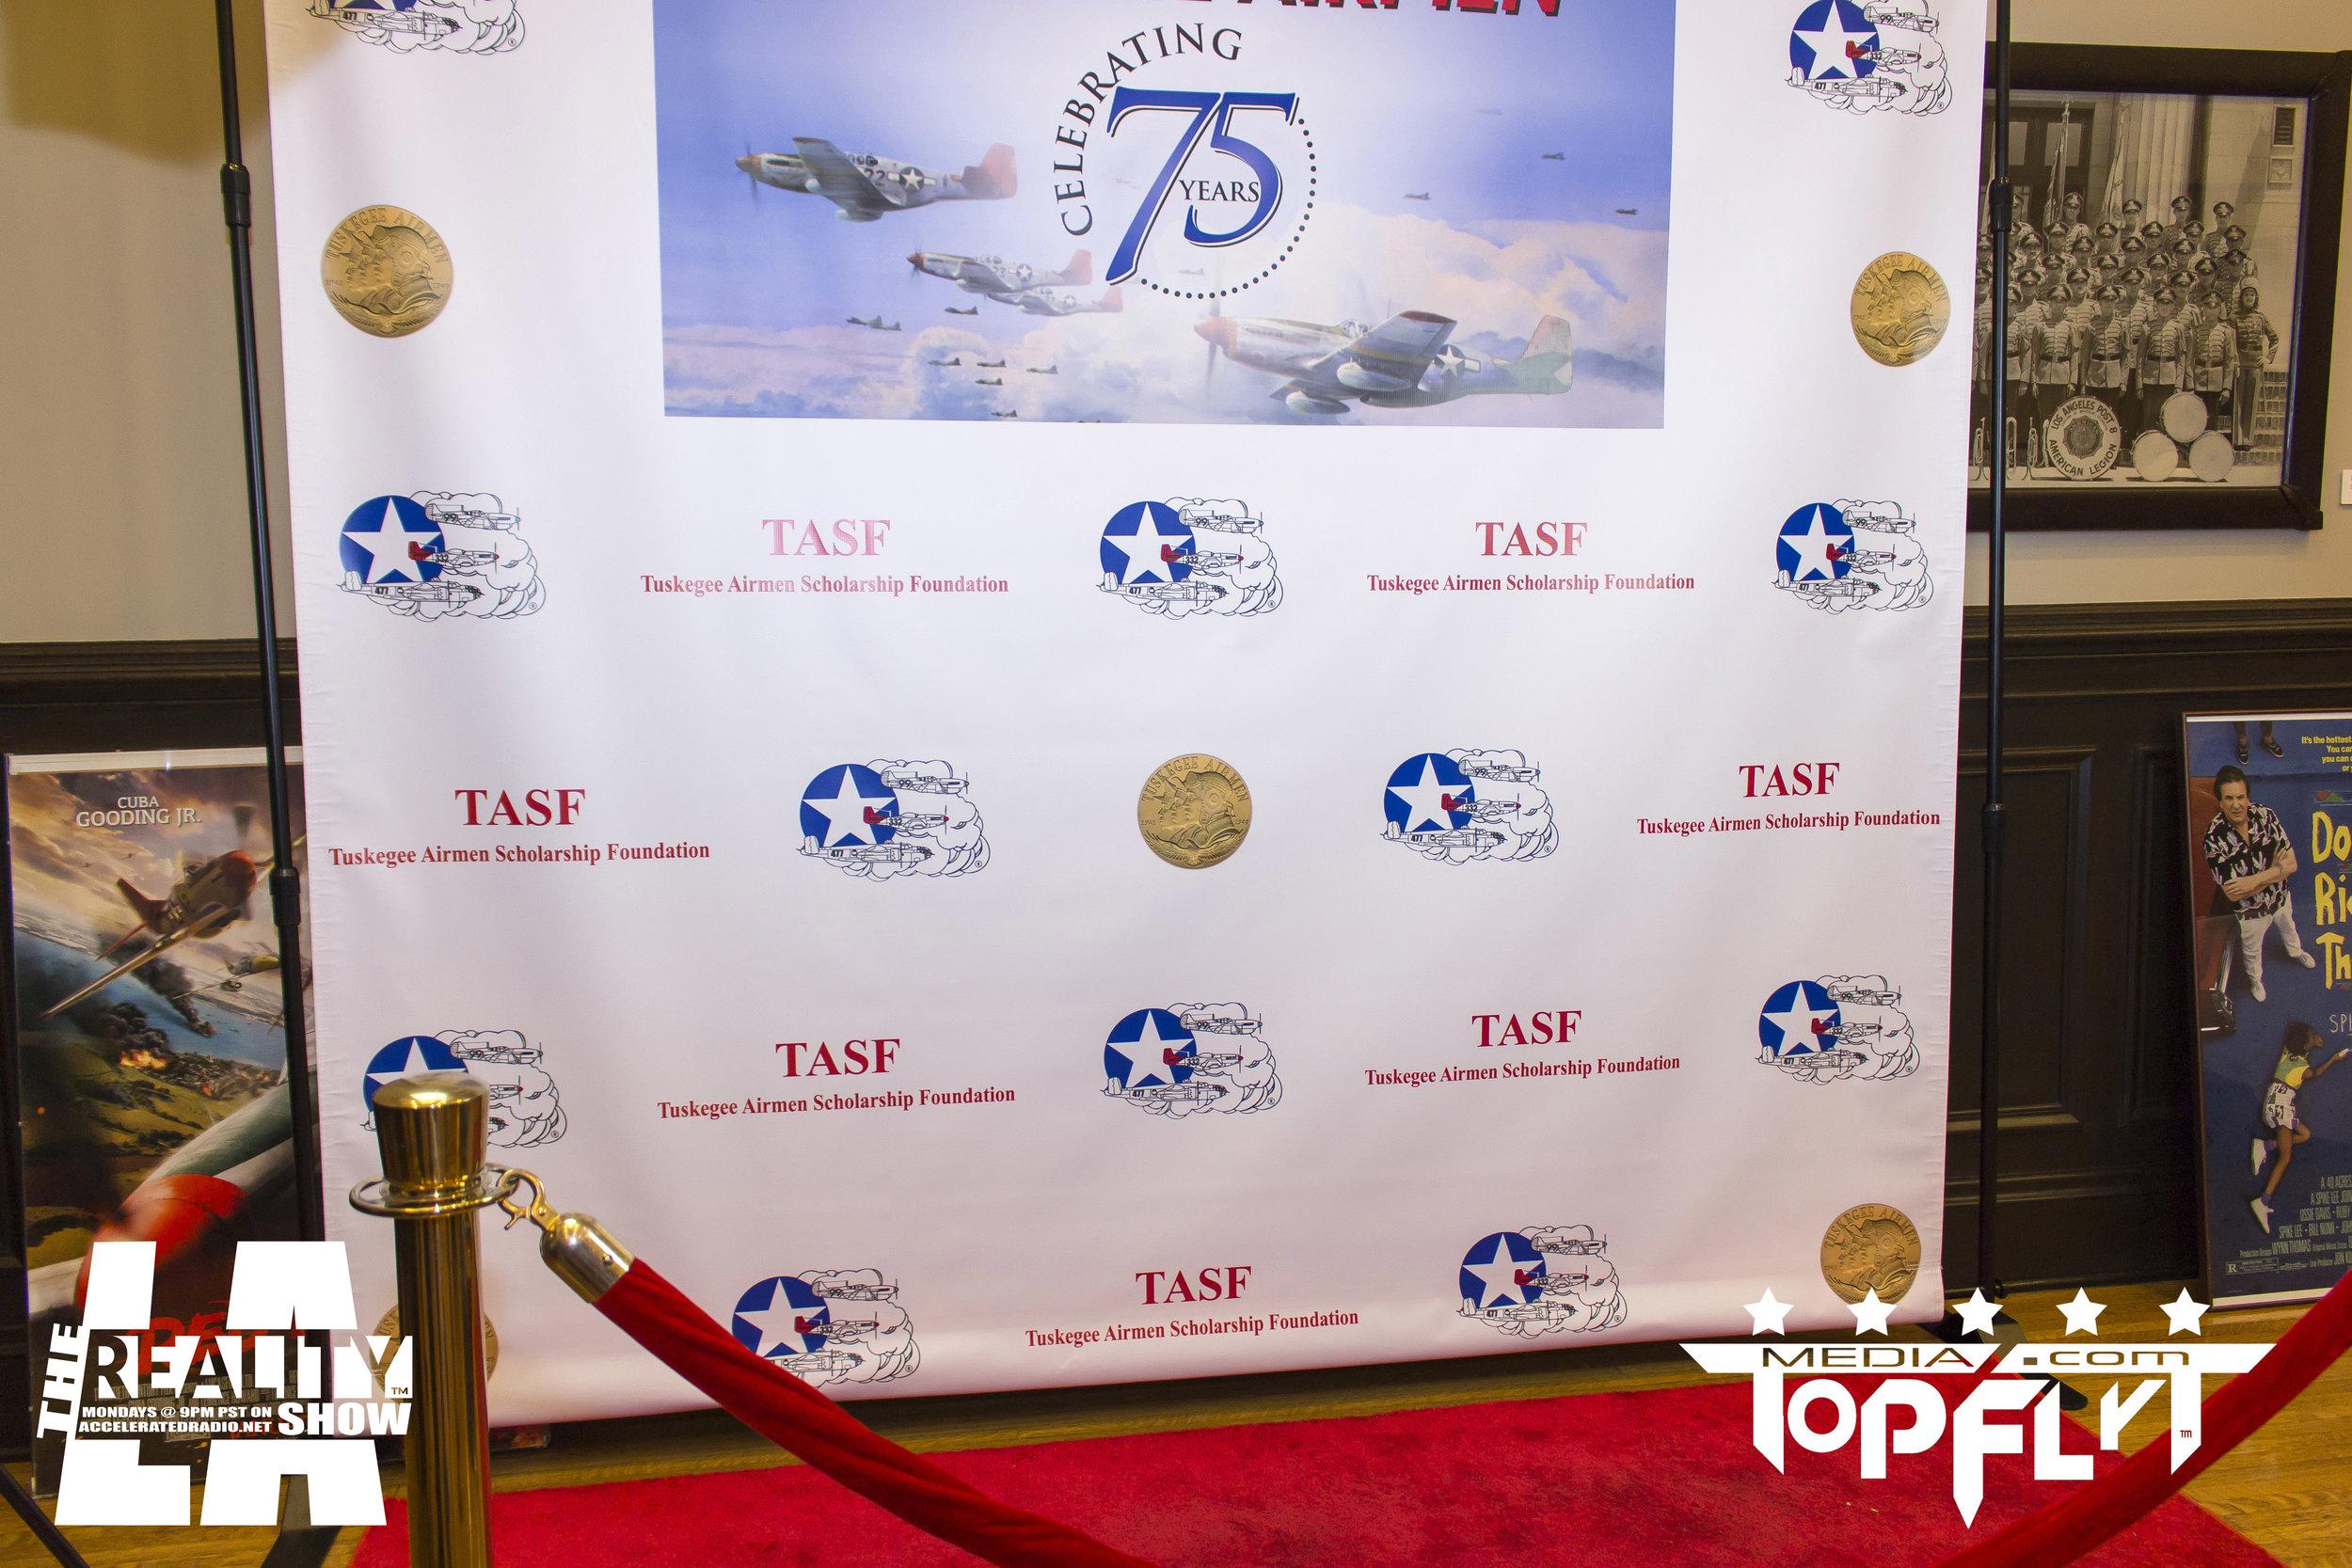 The Reality Show LA - Tuskegee Airmen 75th Anniversary VIP Reception_35.jpg